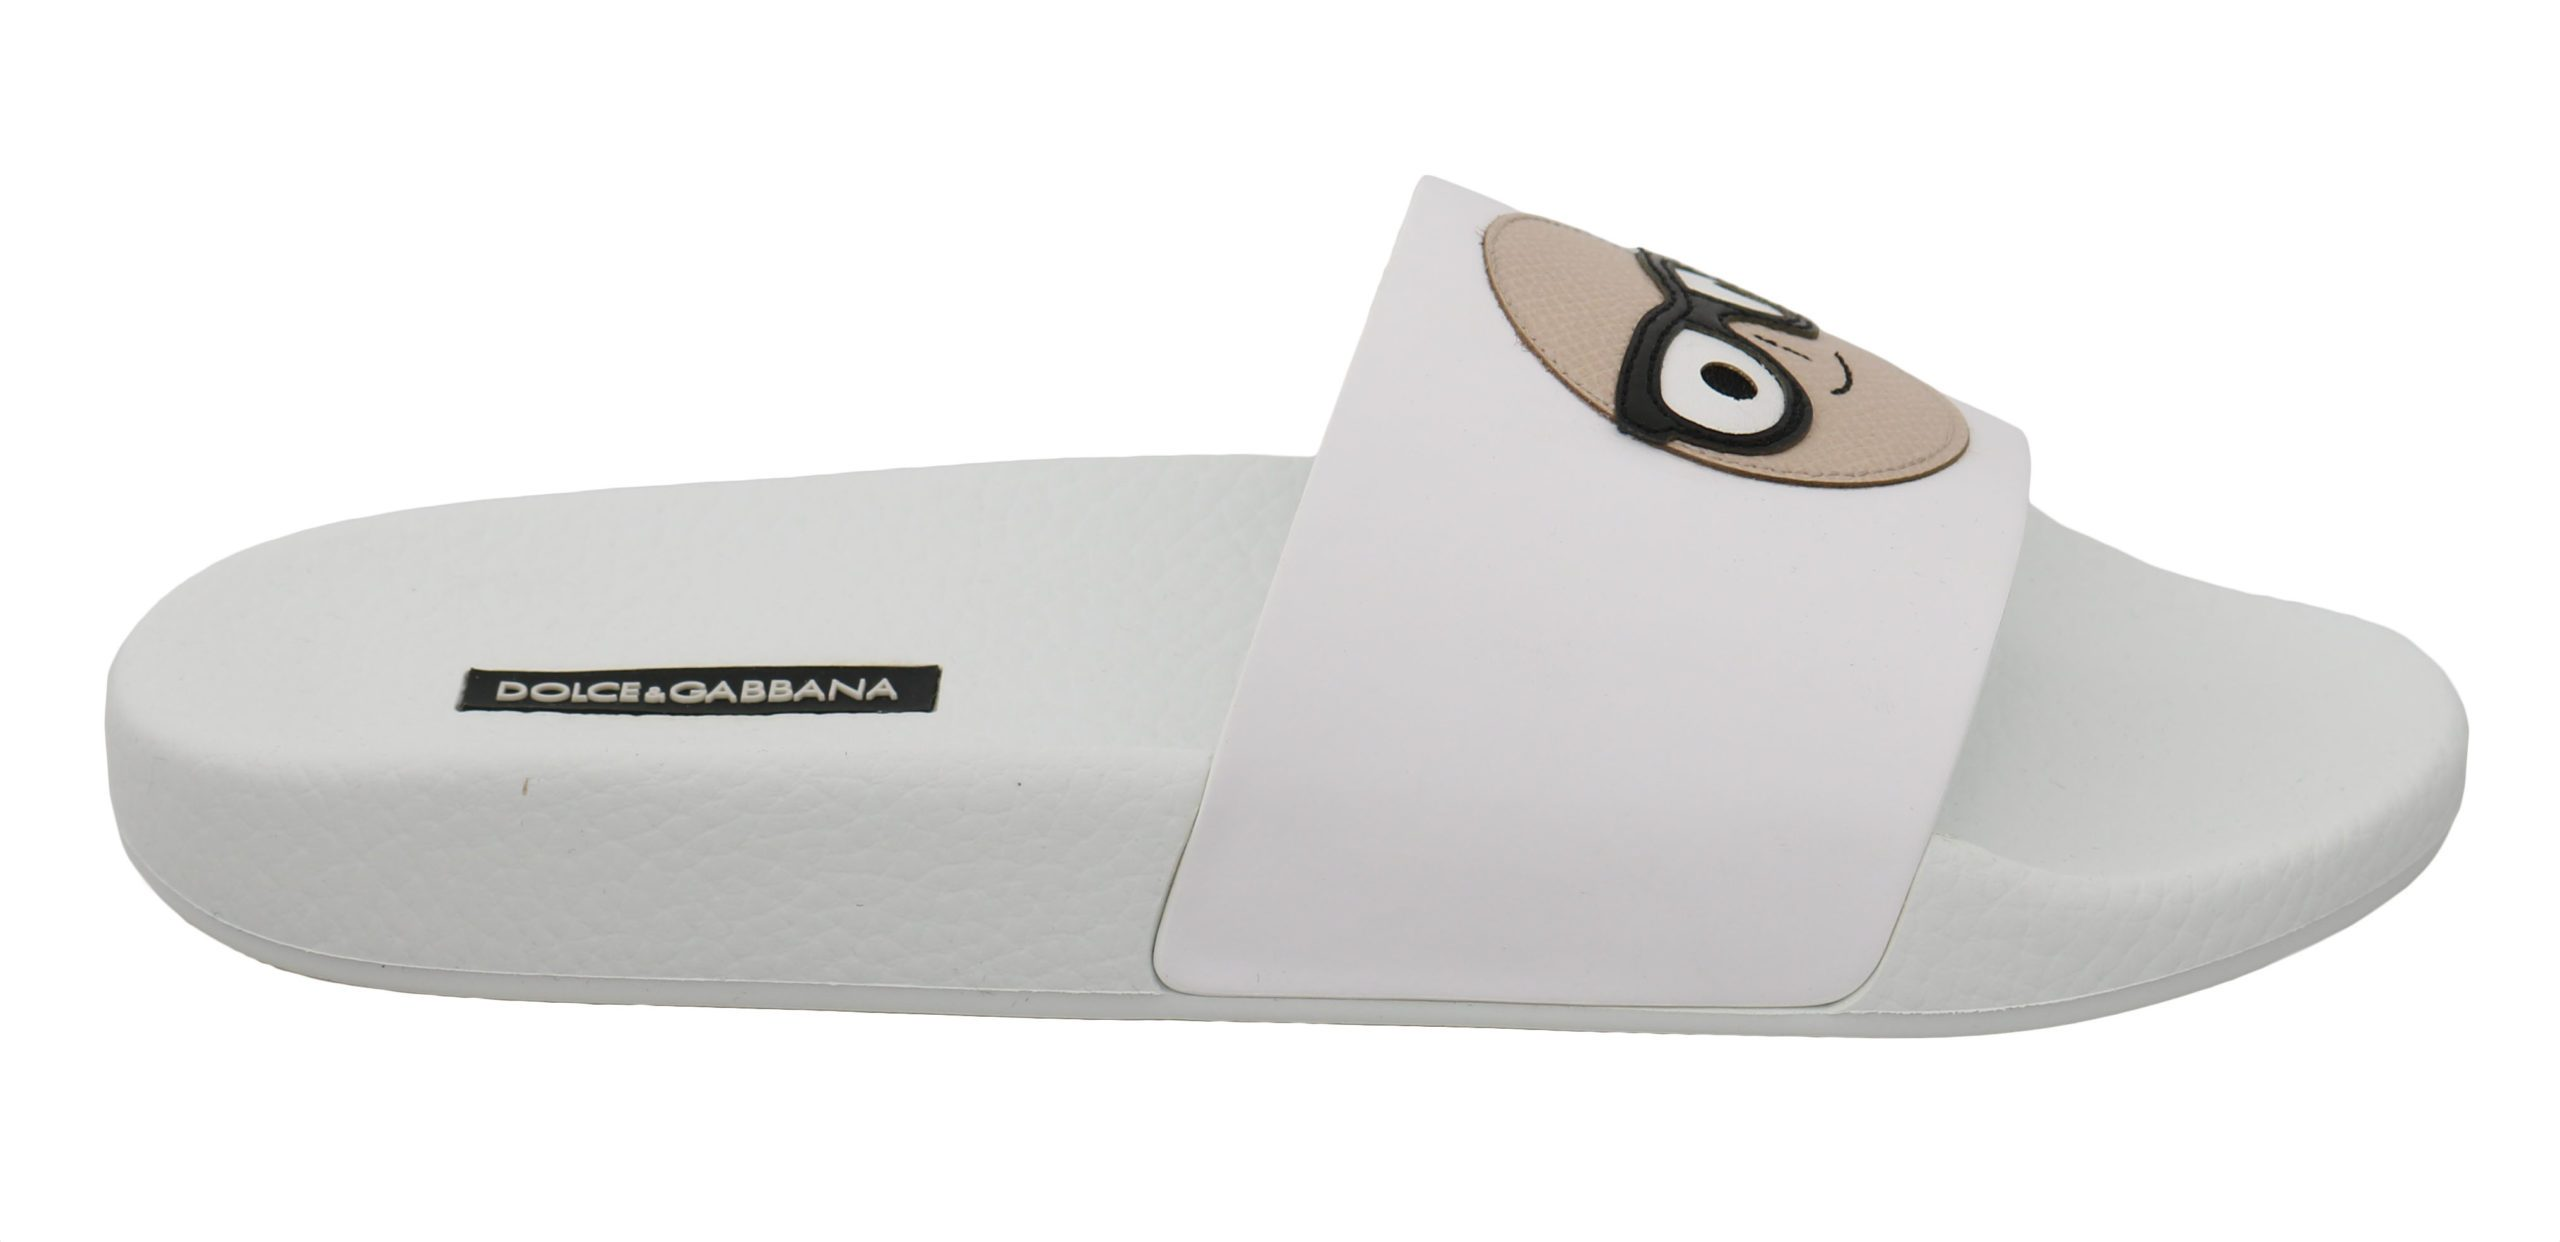 Dolce & Gabbana Women's Leather Slides Sandals White LA6250 - EU35/US4.5